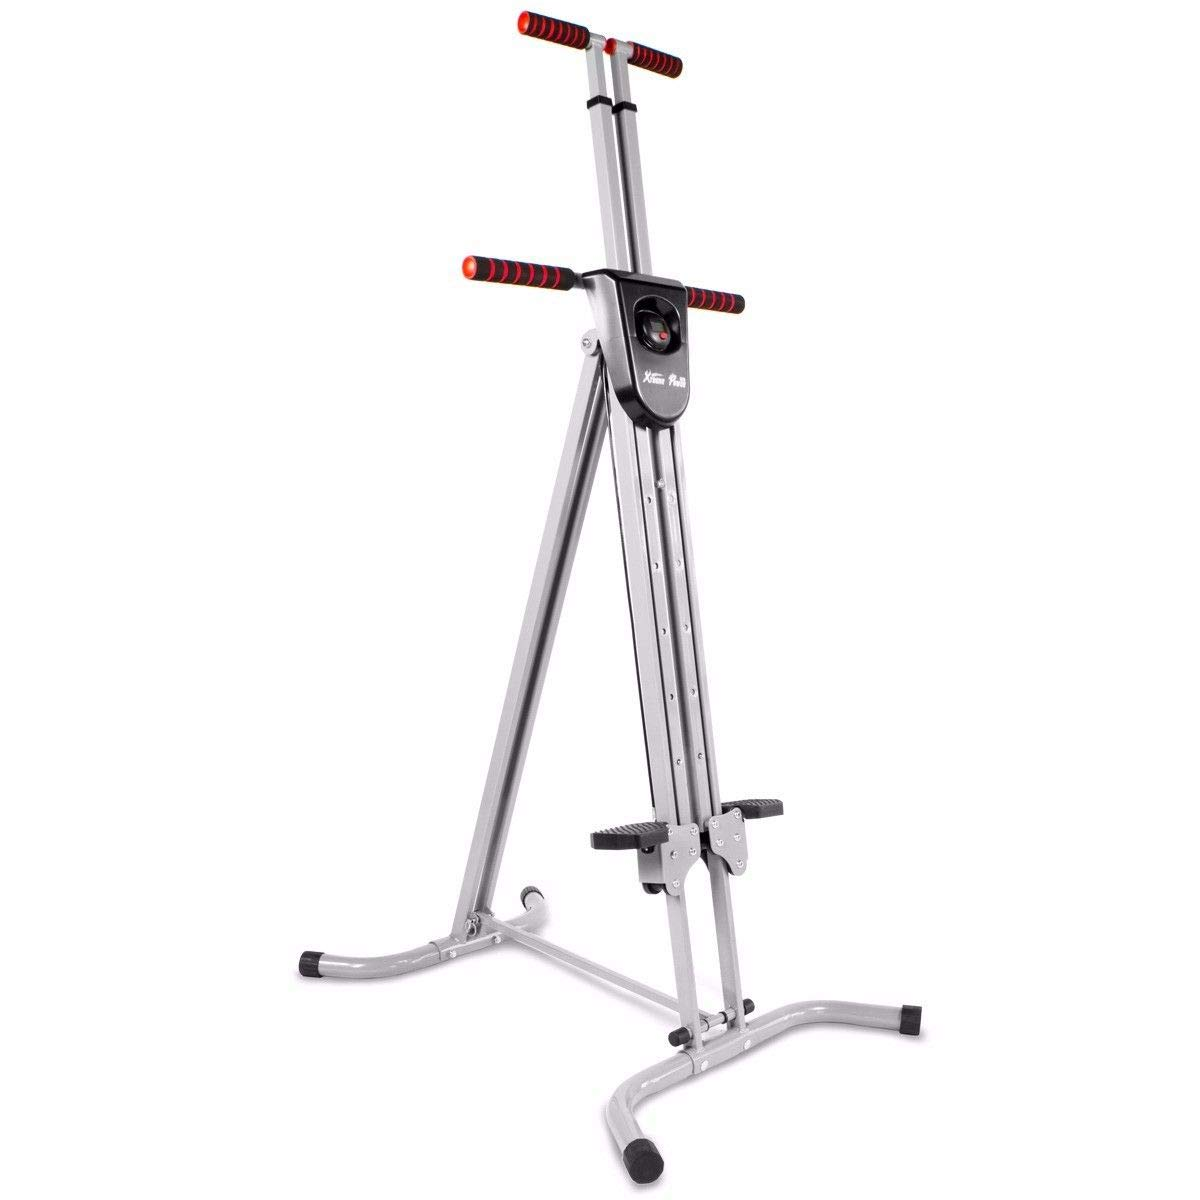 XtremepowerUS Vertical Climber Fitness Cardio Exercise Machine by XtremepowerUS (Image #3)